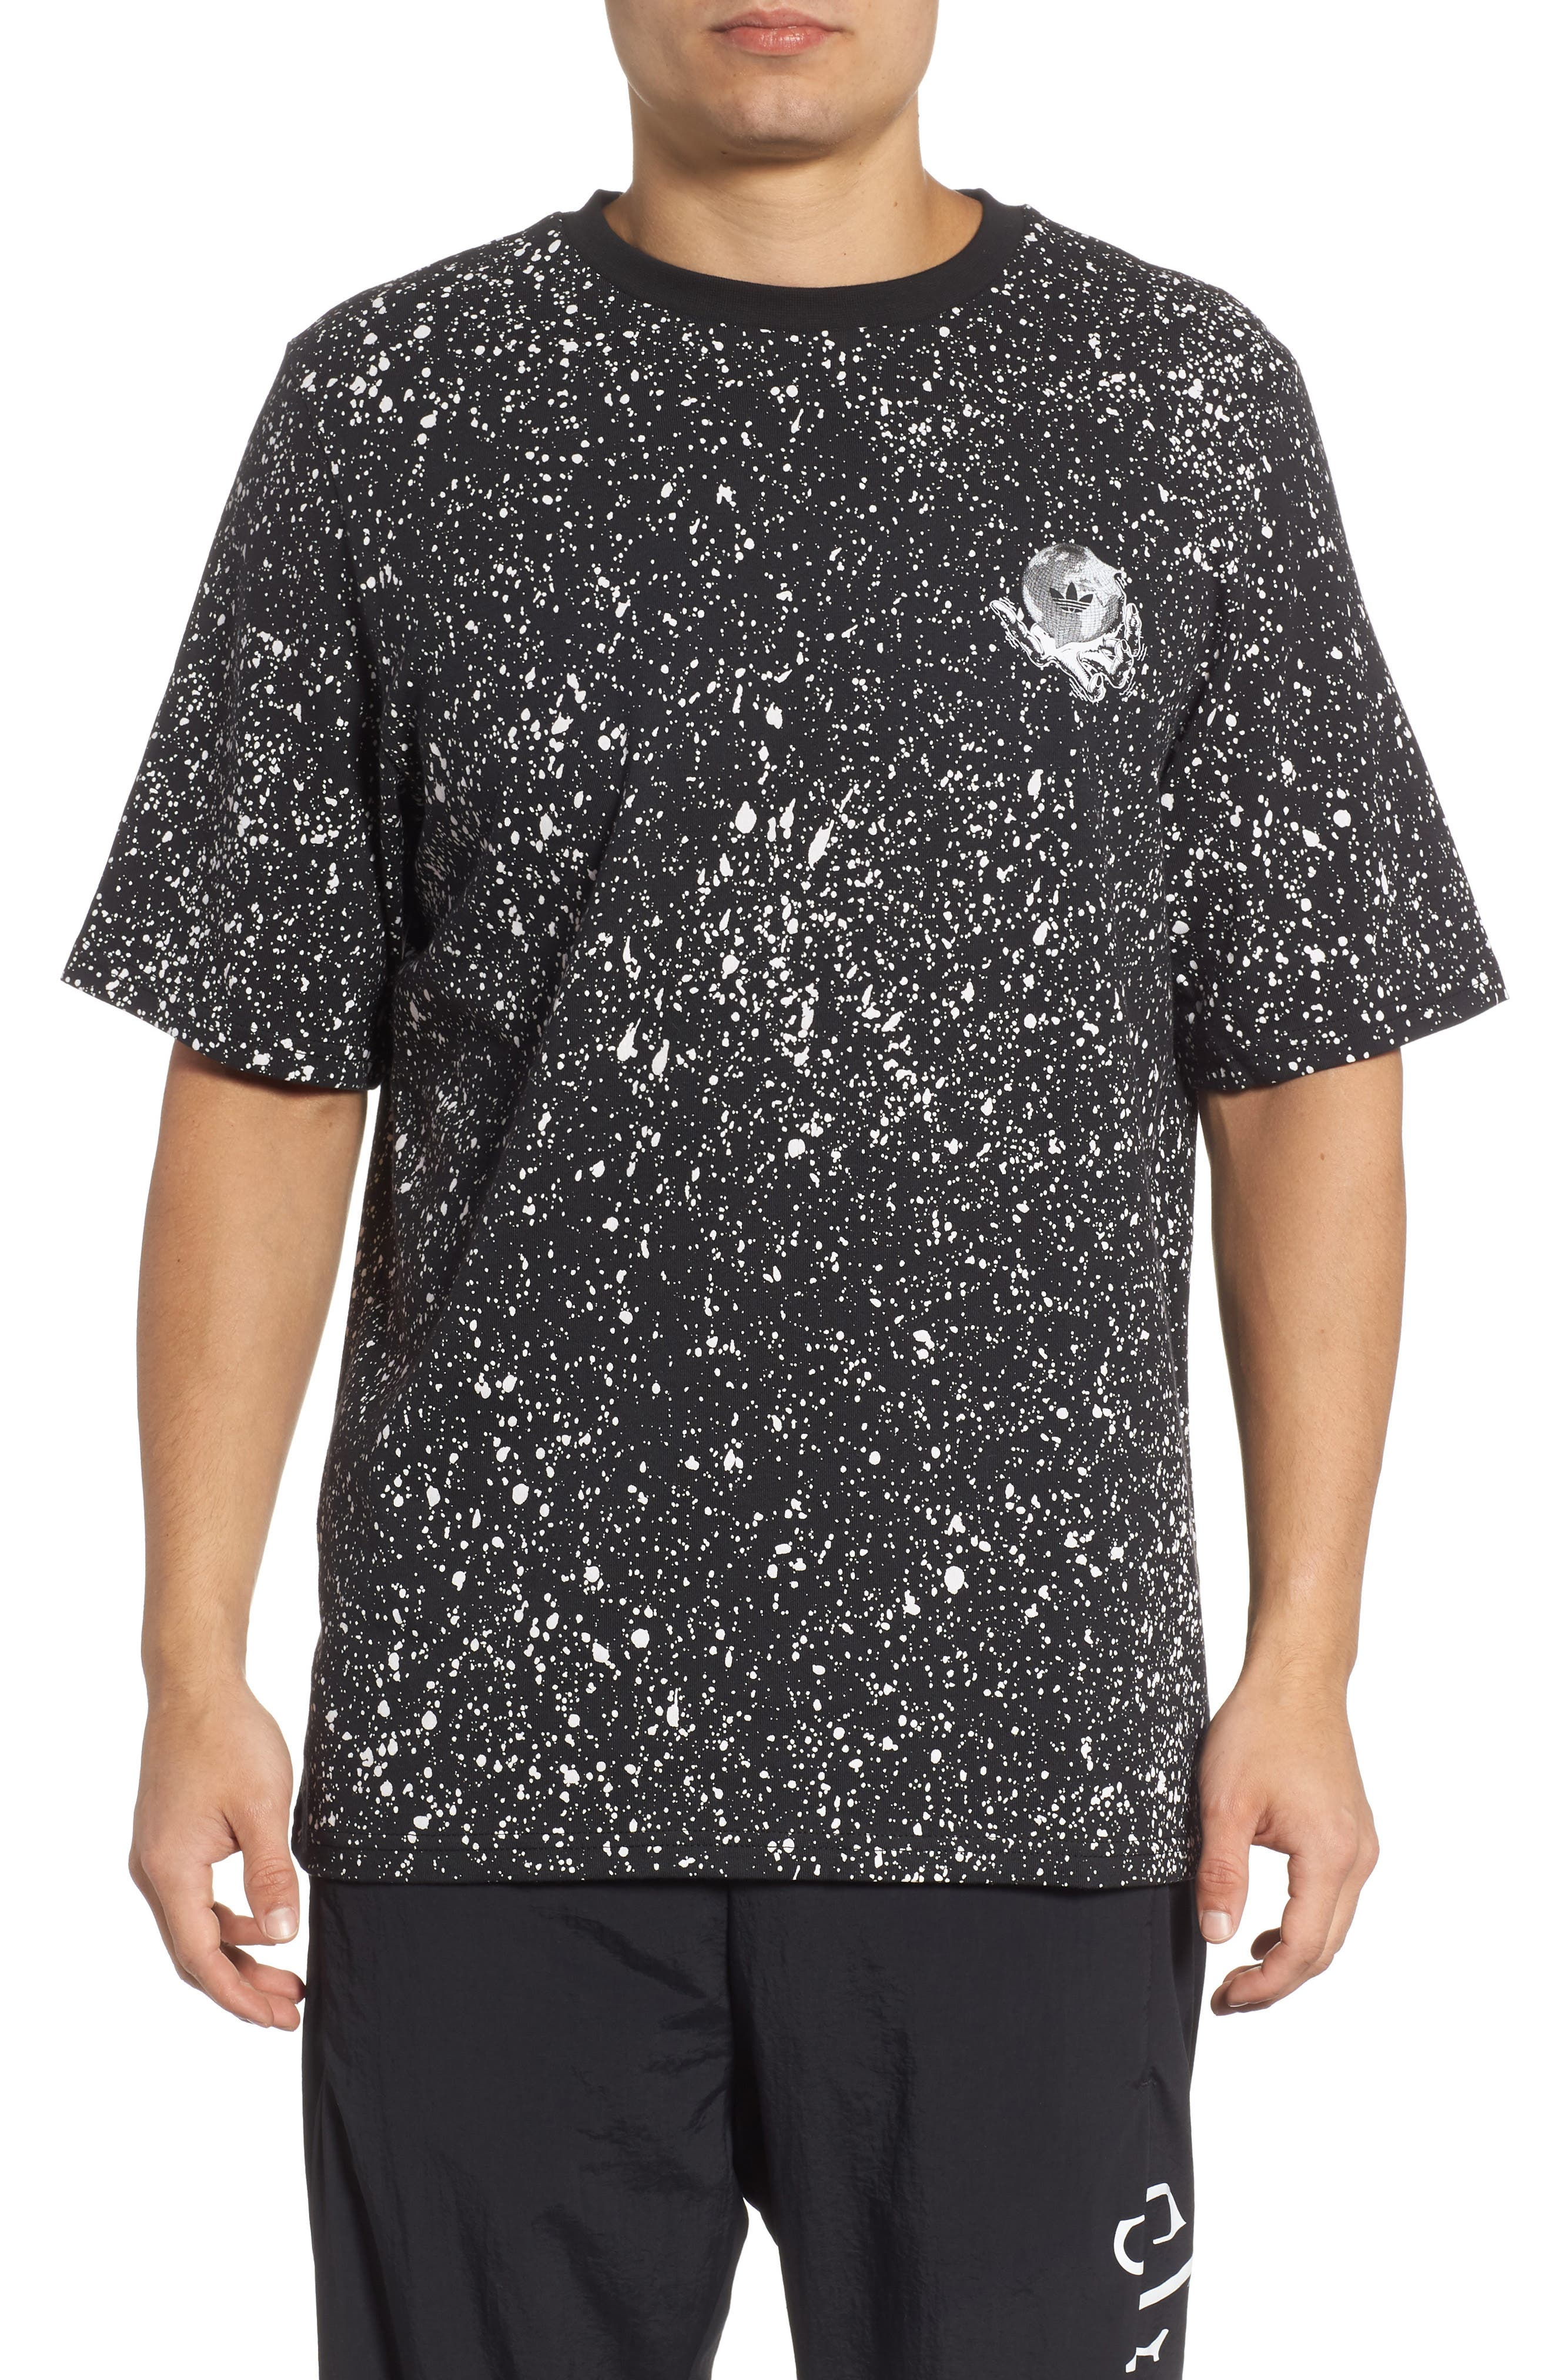 Planetoid Allover Print T-Shirt,                         Main,                         color, BLACK